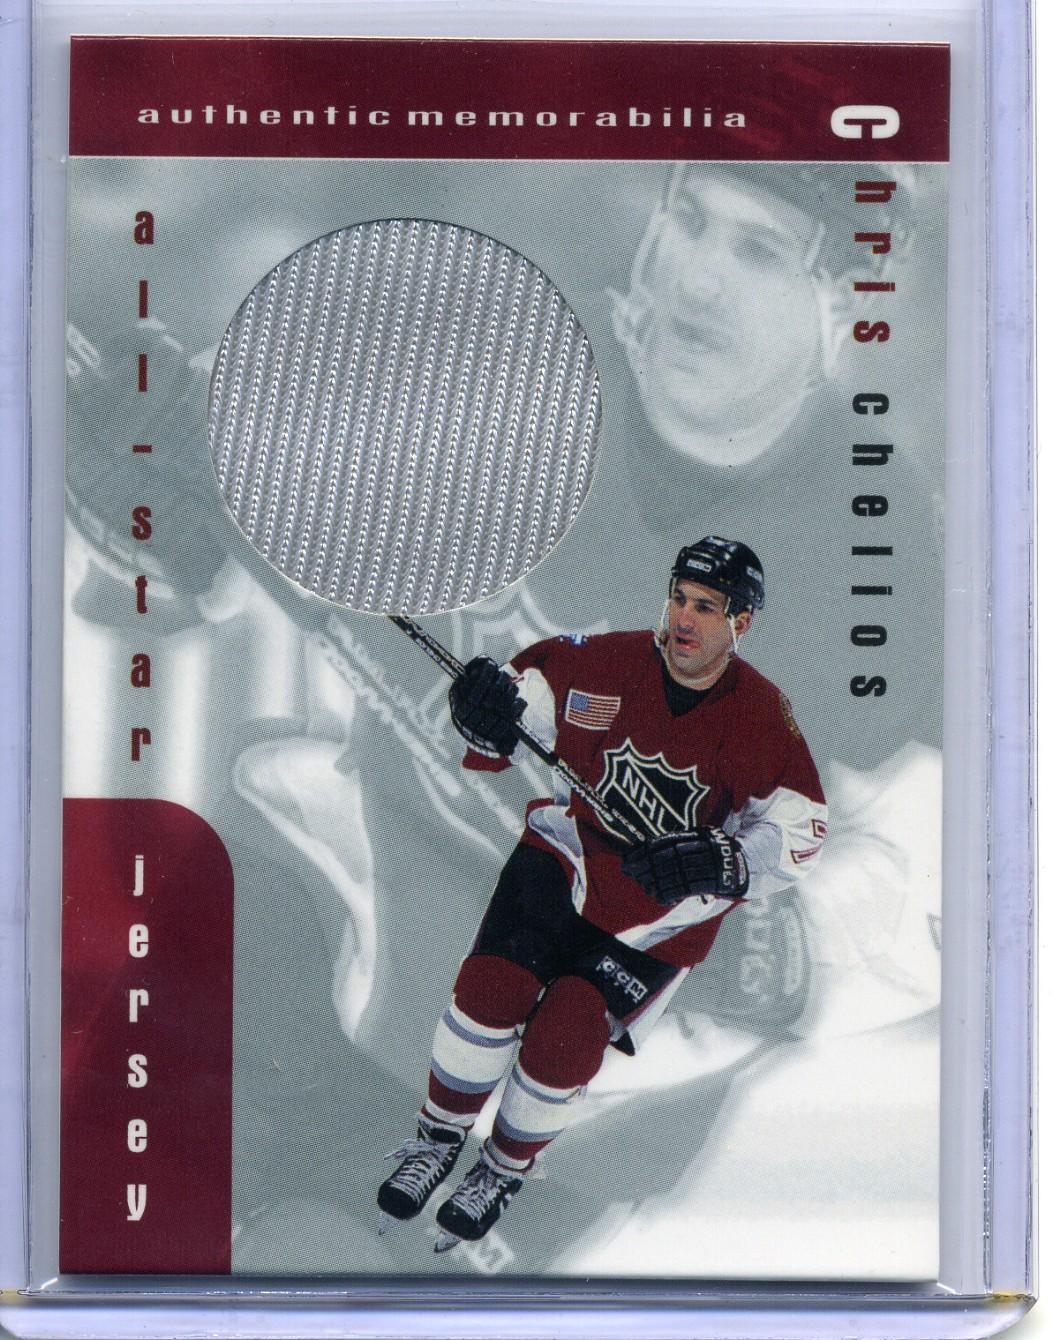 1999-00 BAP Memorabilia Jersey #J21 Chris Chelios